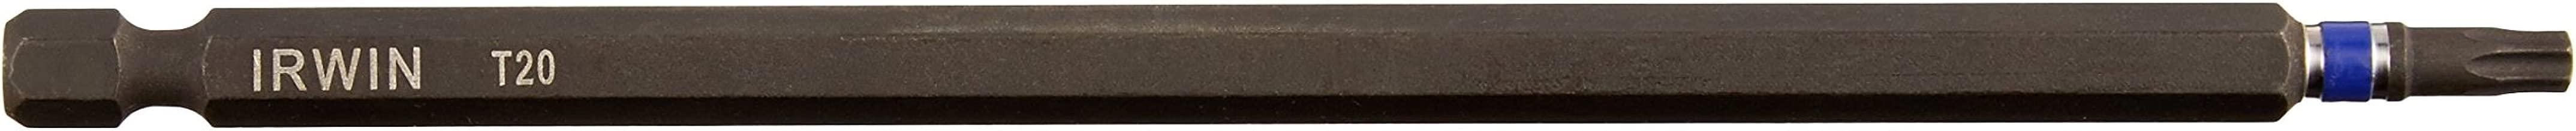 Irwin Tools 1837526 Impact Performance Series TORX T20 Power Bit, 6